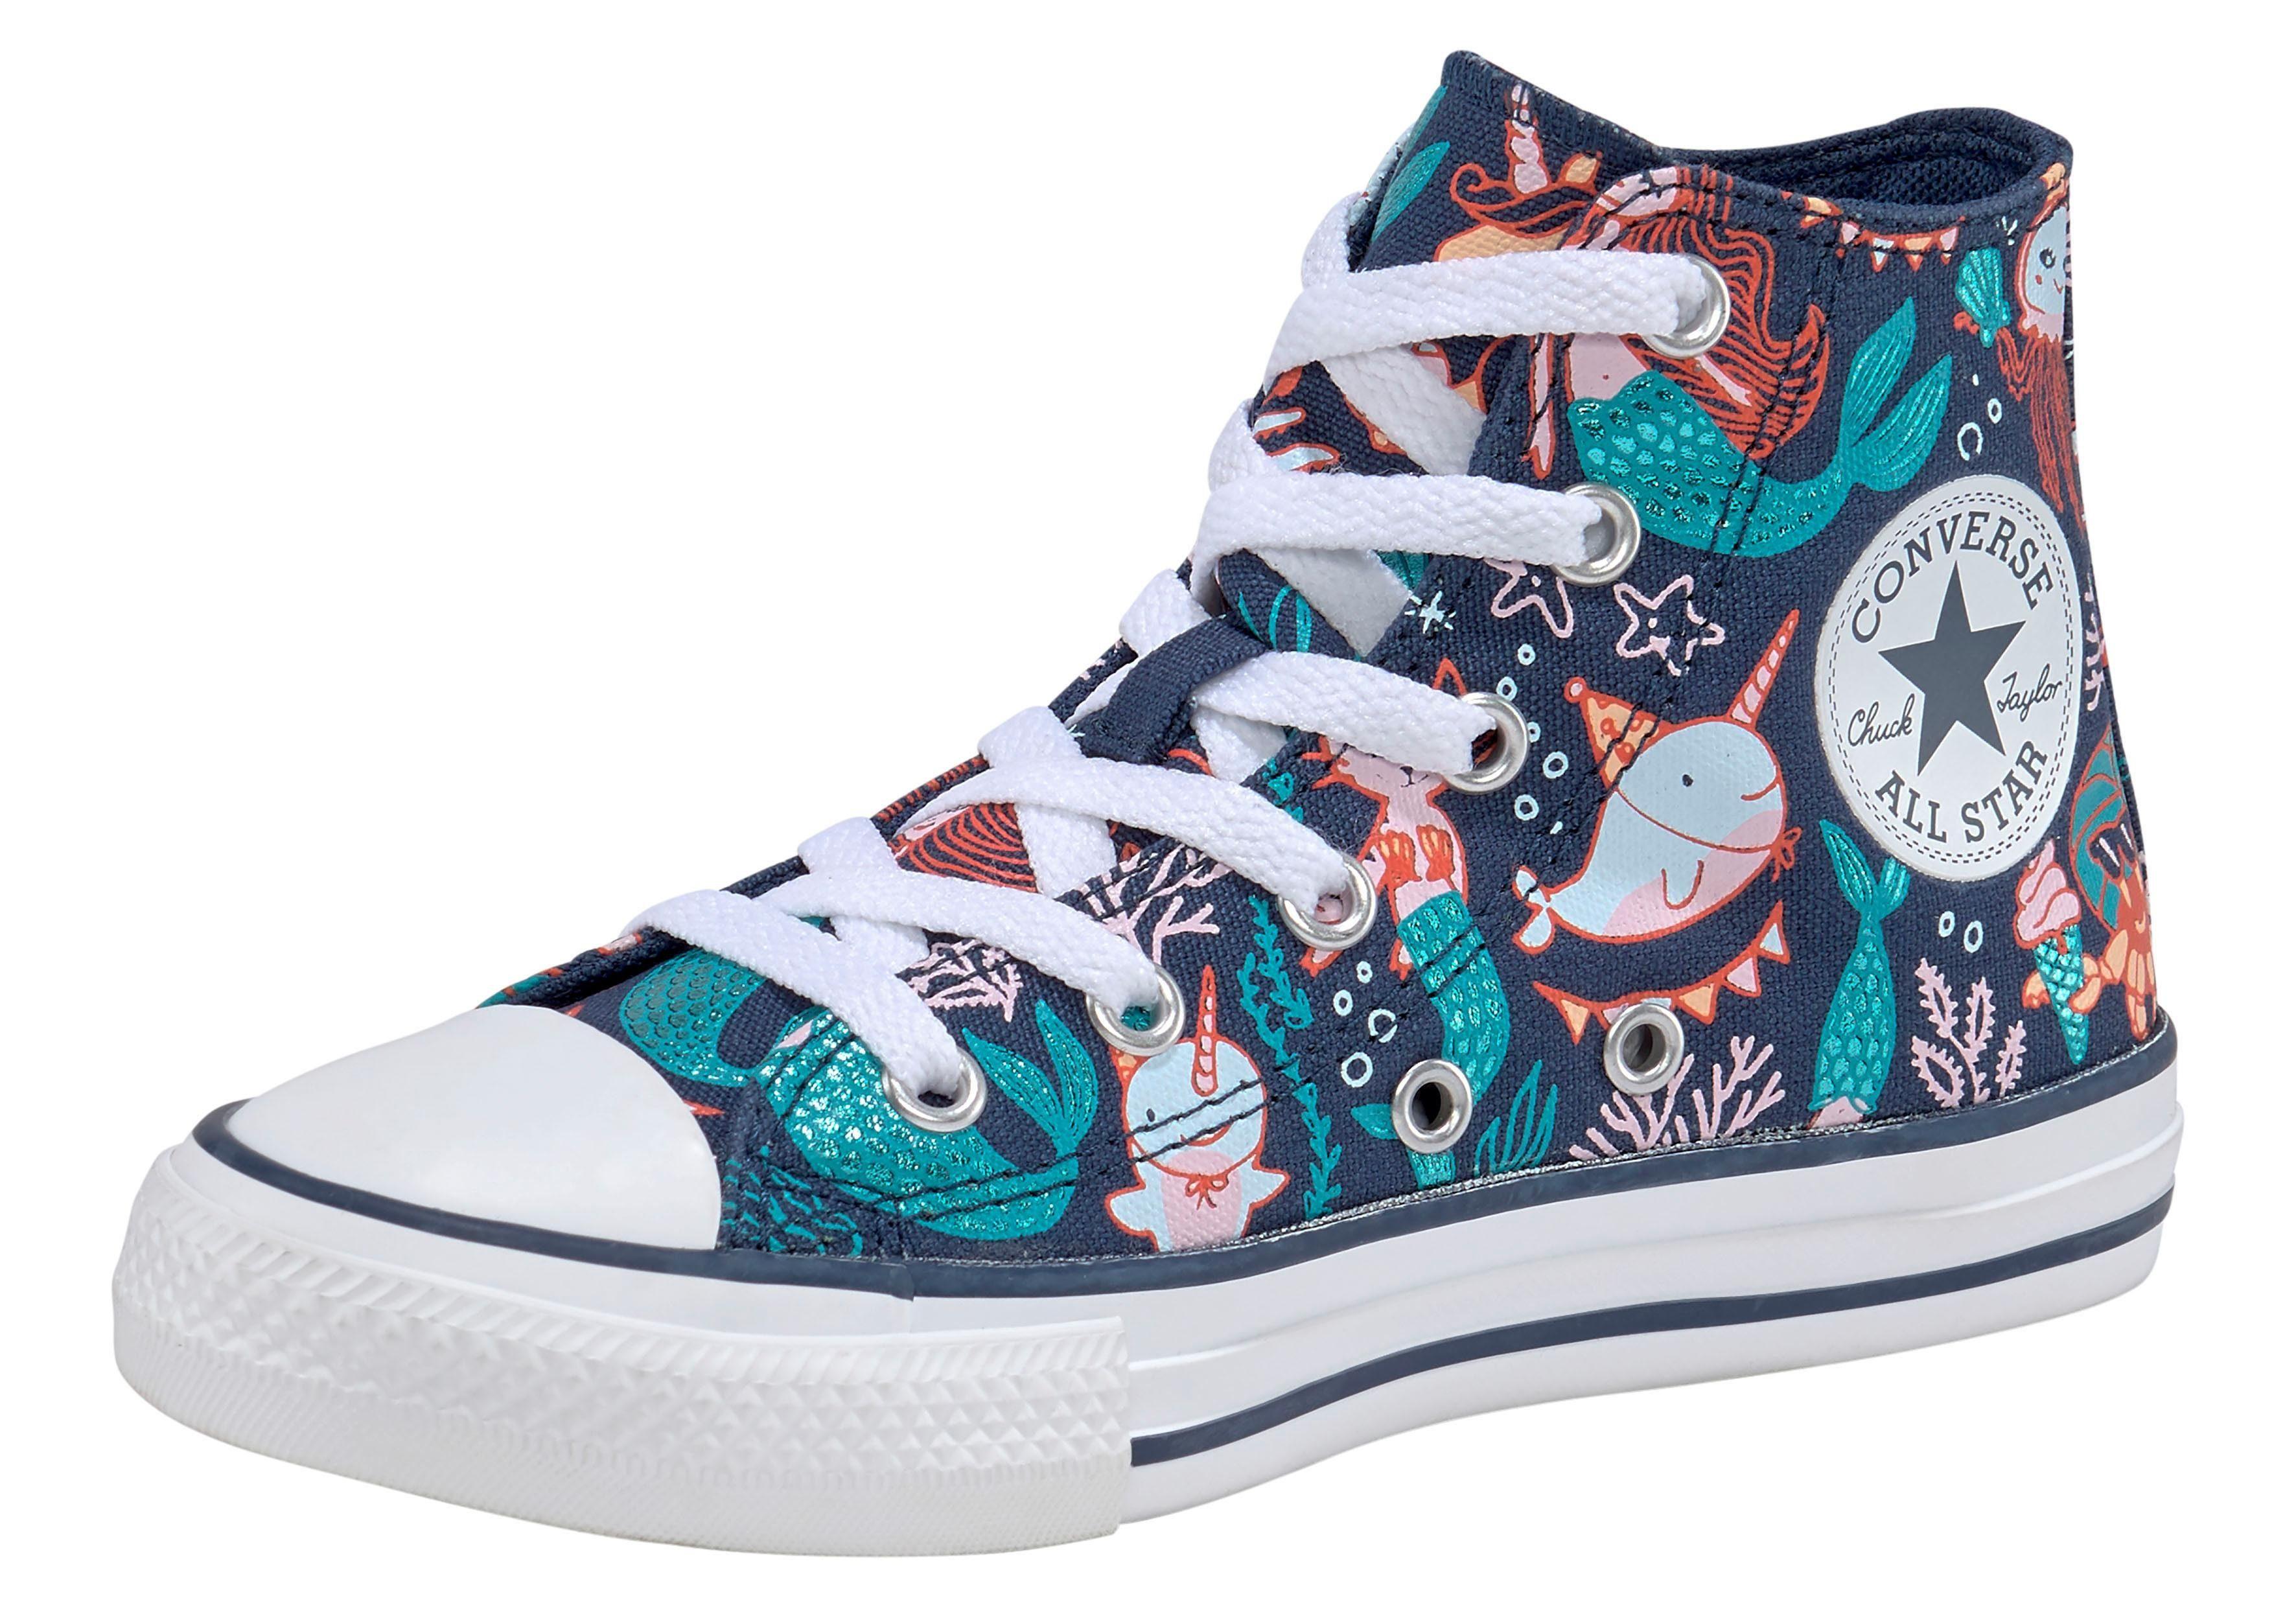 Converse »Kinder CHUCK TAYLOR ALL STAR HI Mermaid« Sneaker online kaufen | OTTO